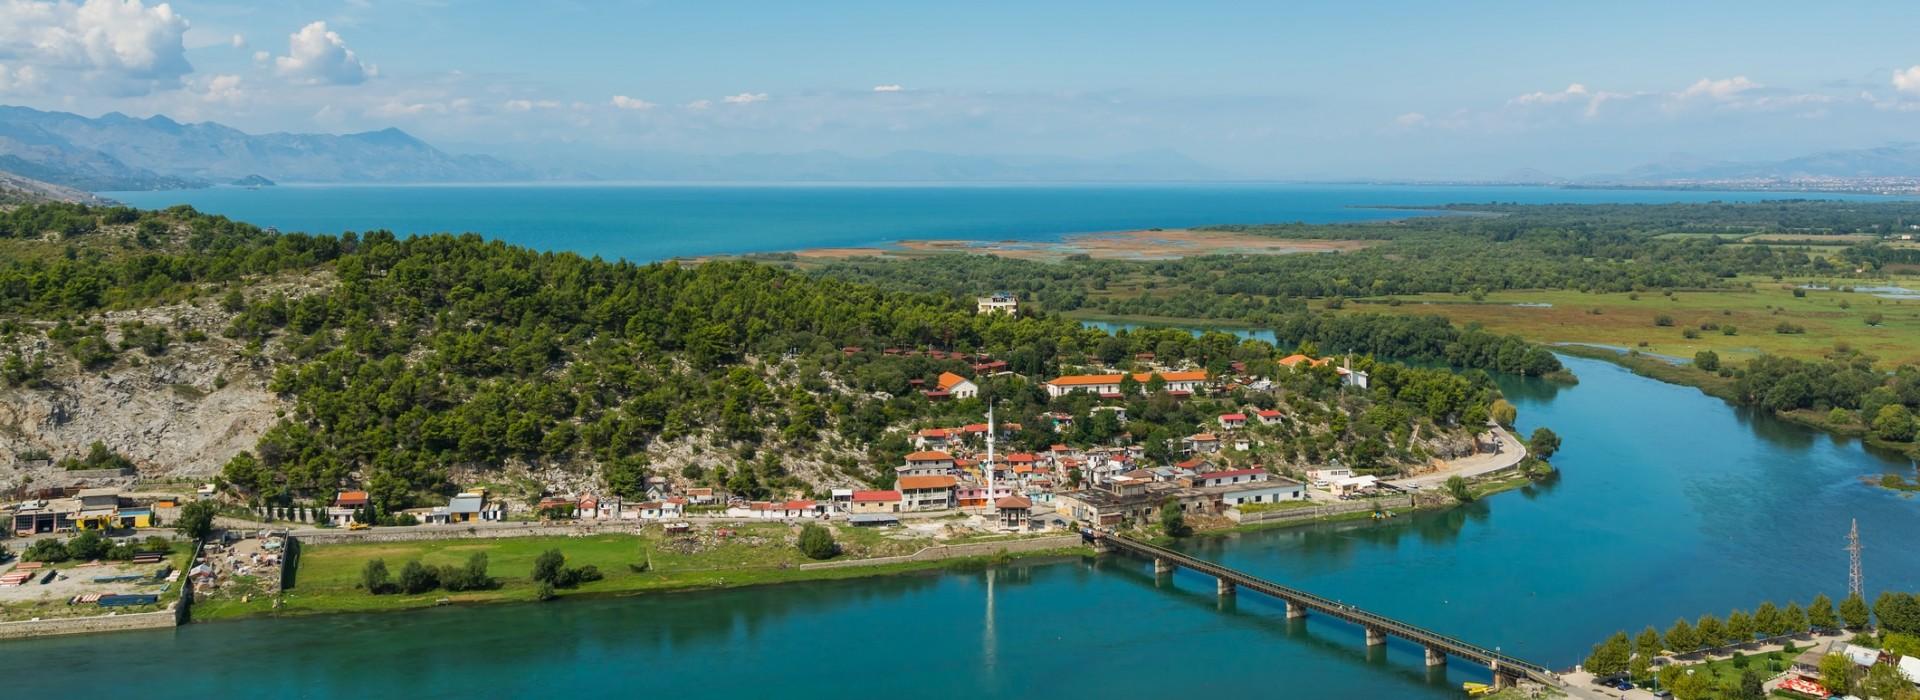 Albania Tours and Trips to Albania